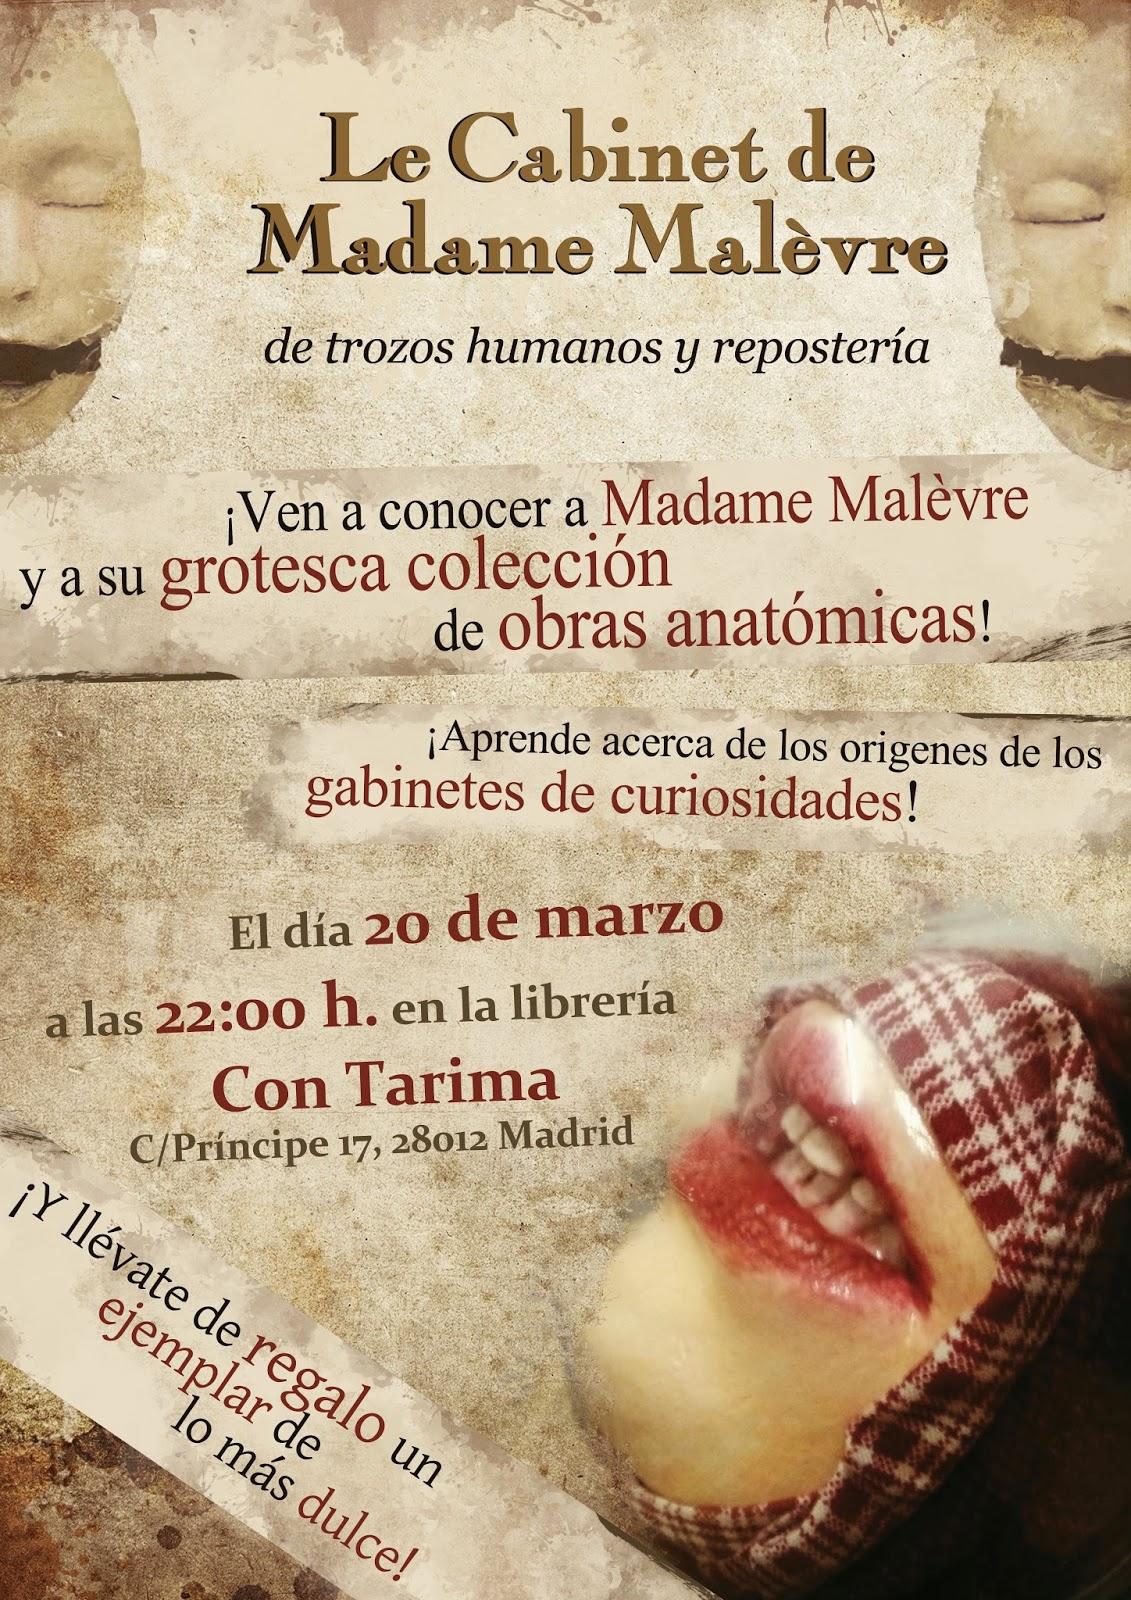 http://www.madamemalevre.com/2015/02/el-lider-en-la-sombra-del-cabinet-en-la.html